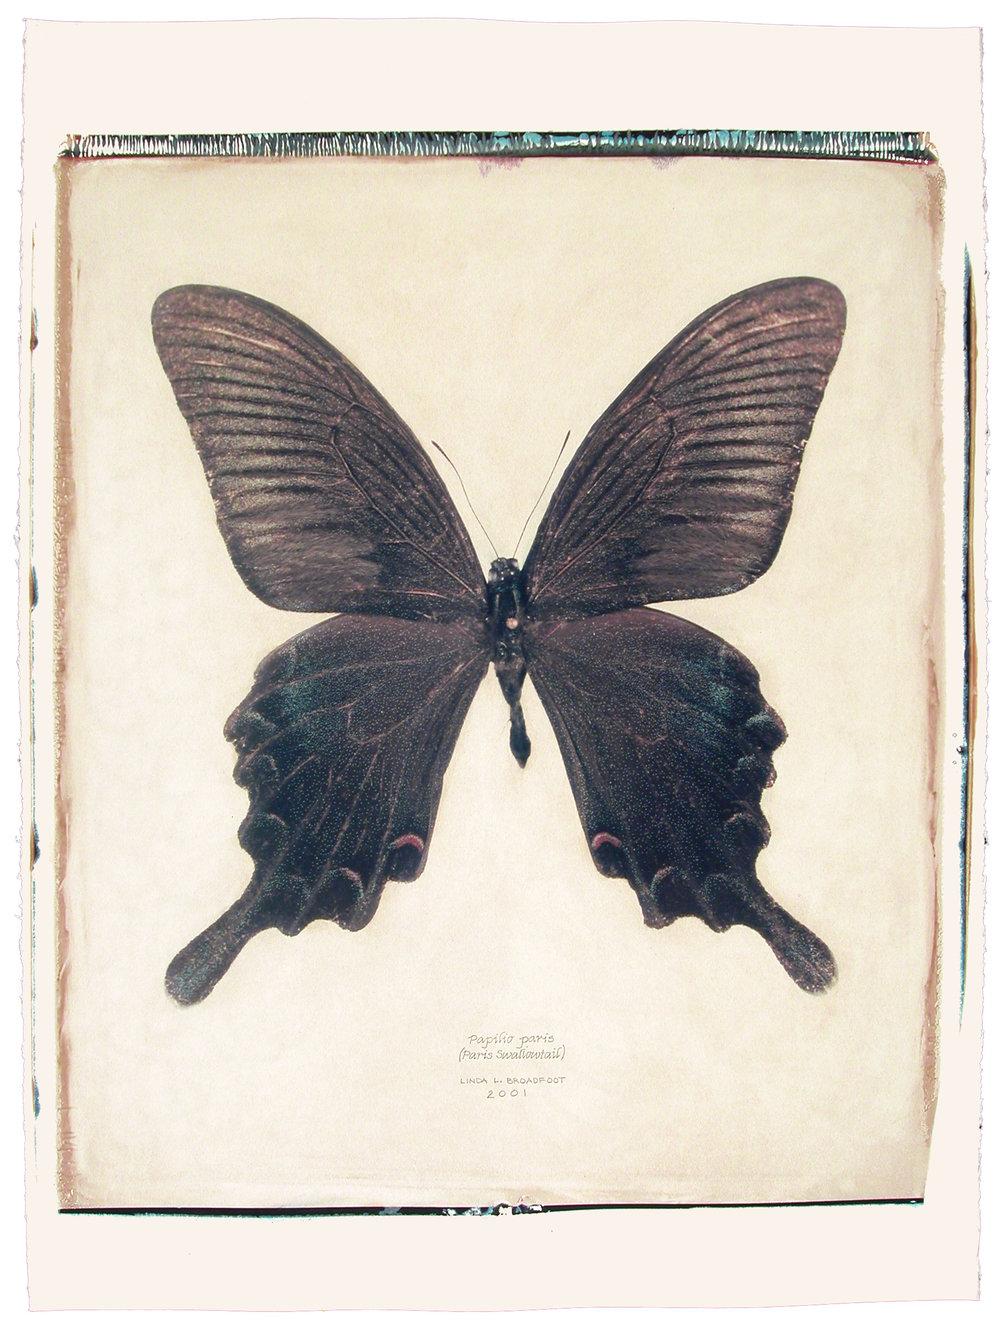 Papilio paris  (Paris Swallowtail), 2001